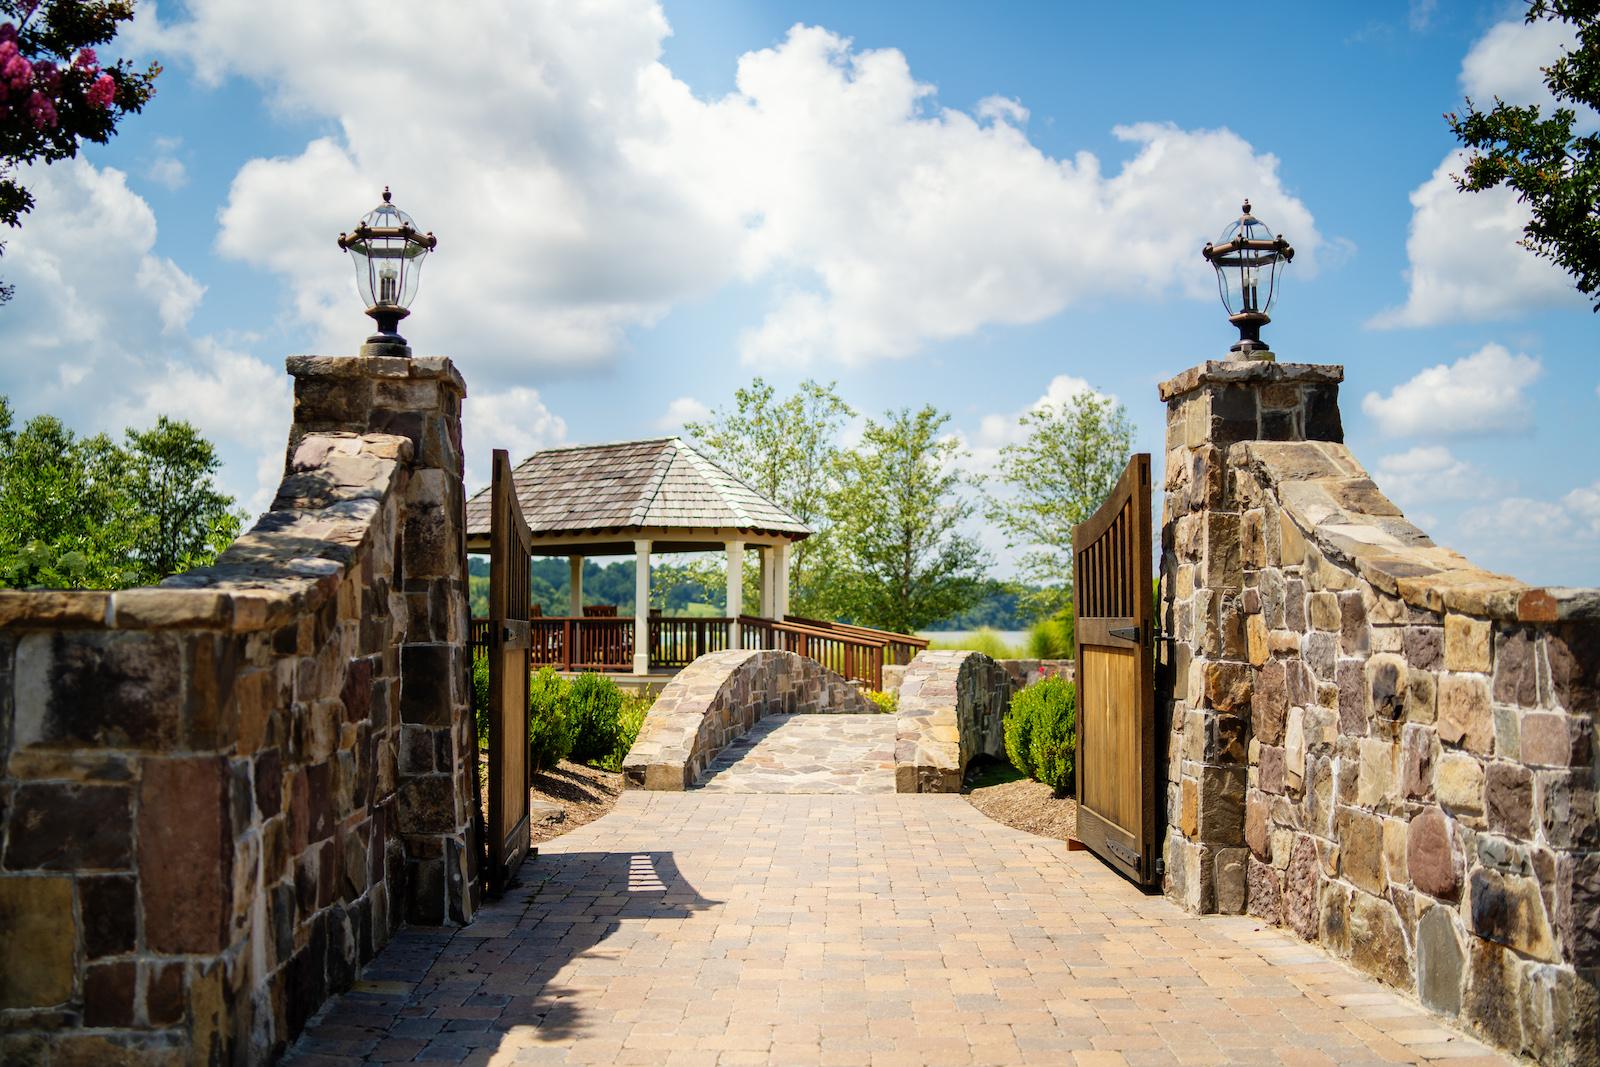 Herring Bay Garden Entrance